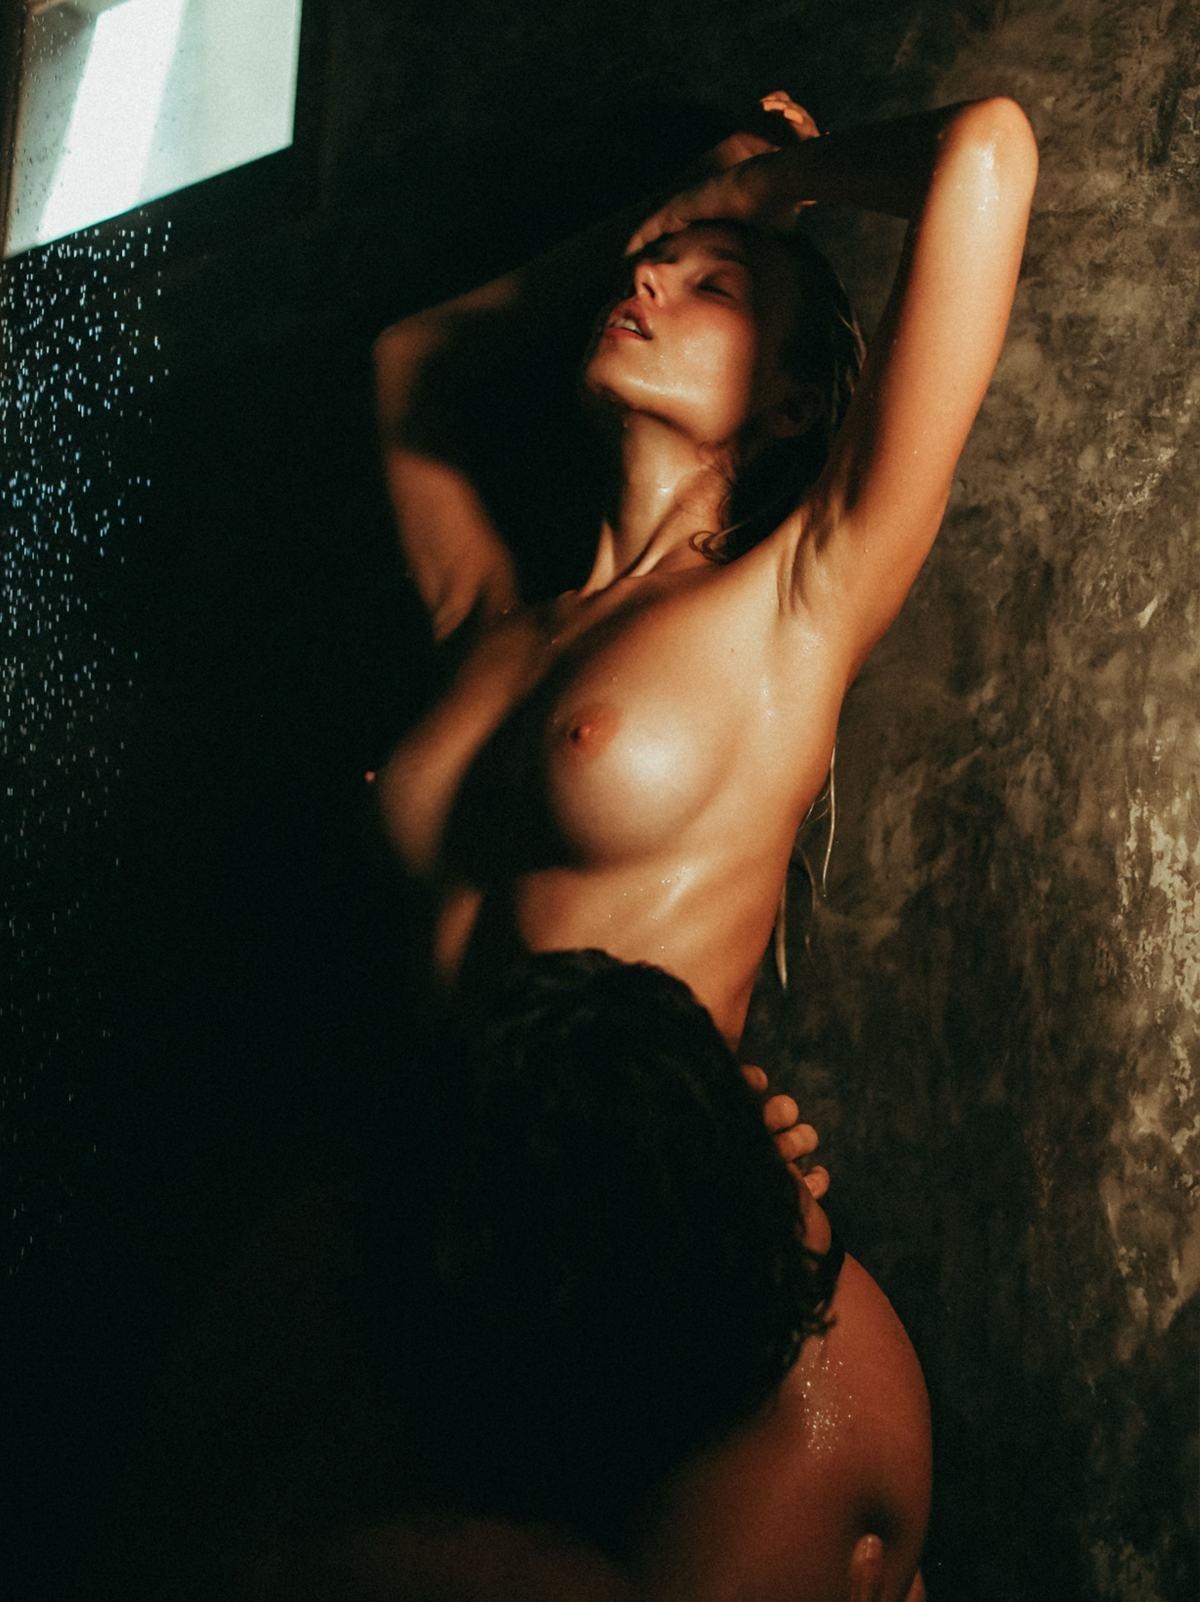 Polina Malinovskaya Polinamalinovskaya Instagram Nude Leaks 0004